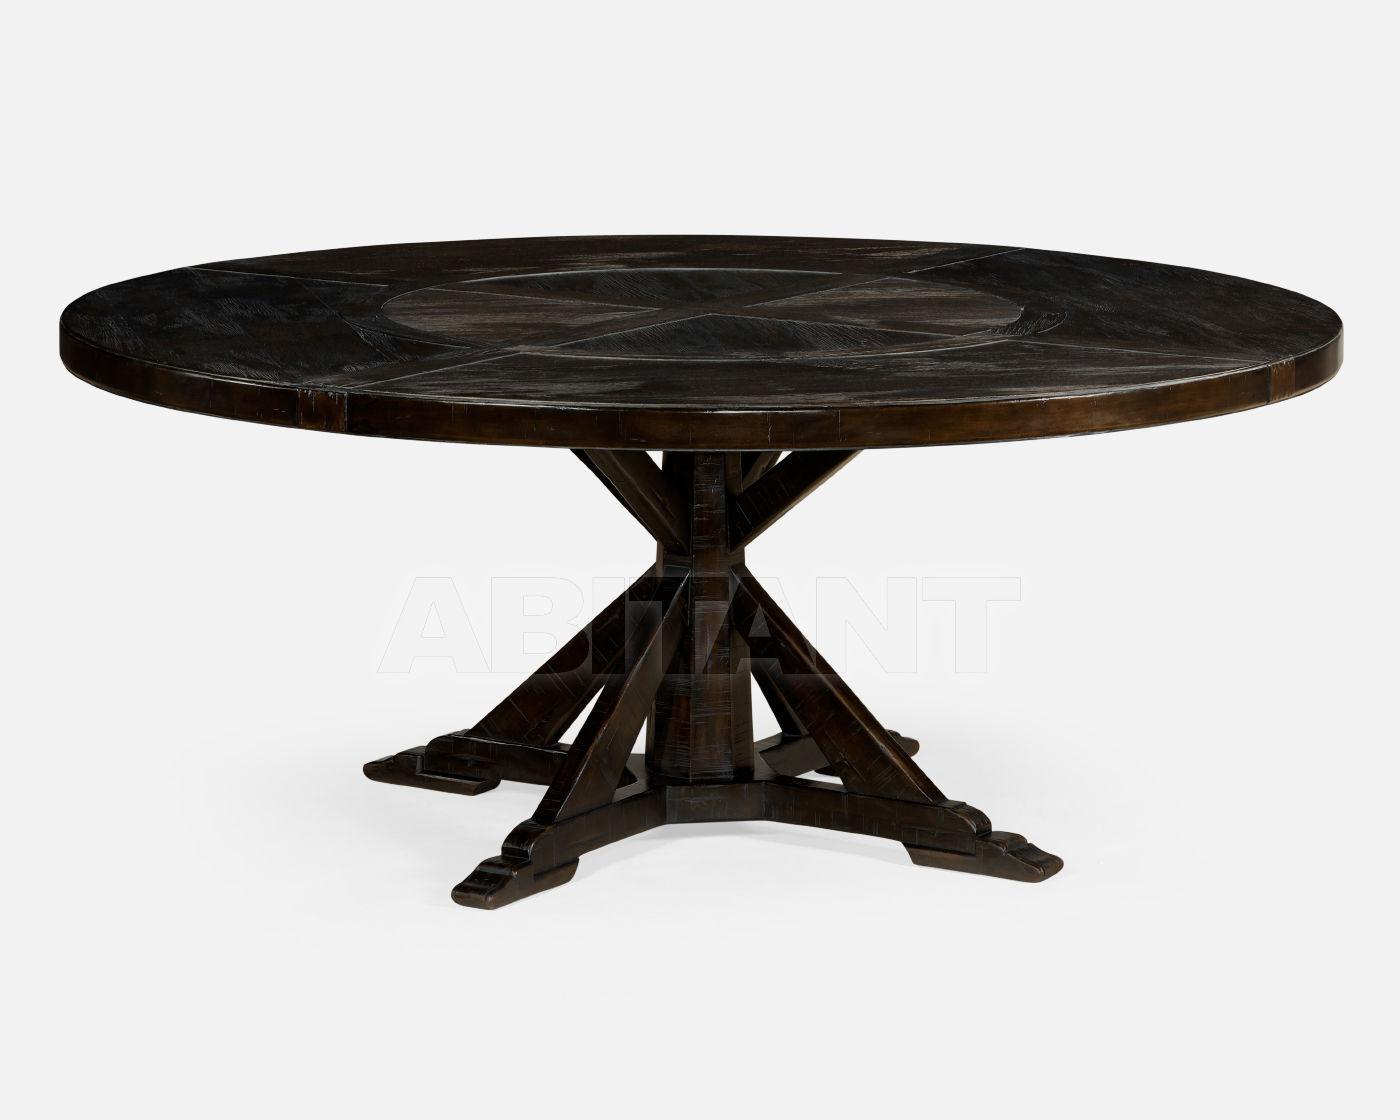 Купить Стол обеденный Jonathan Charles Fine Furniture JC Edited - Casually Country 491101-72D-PDA